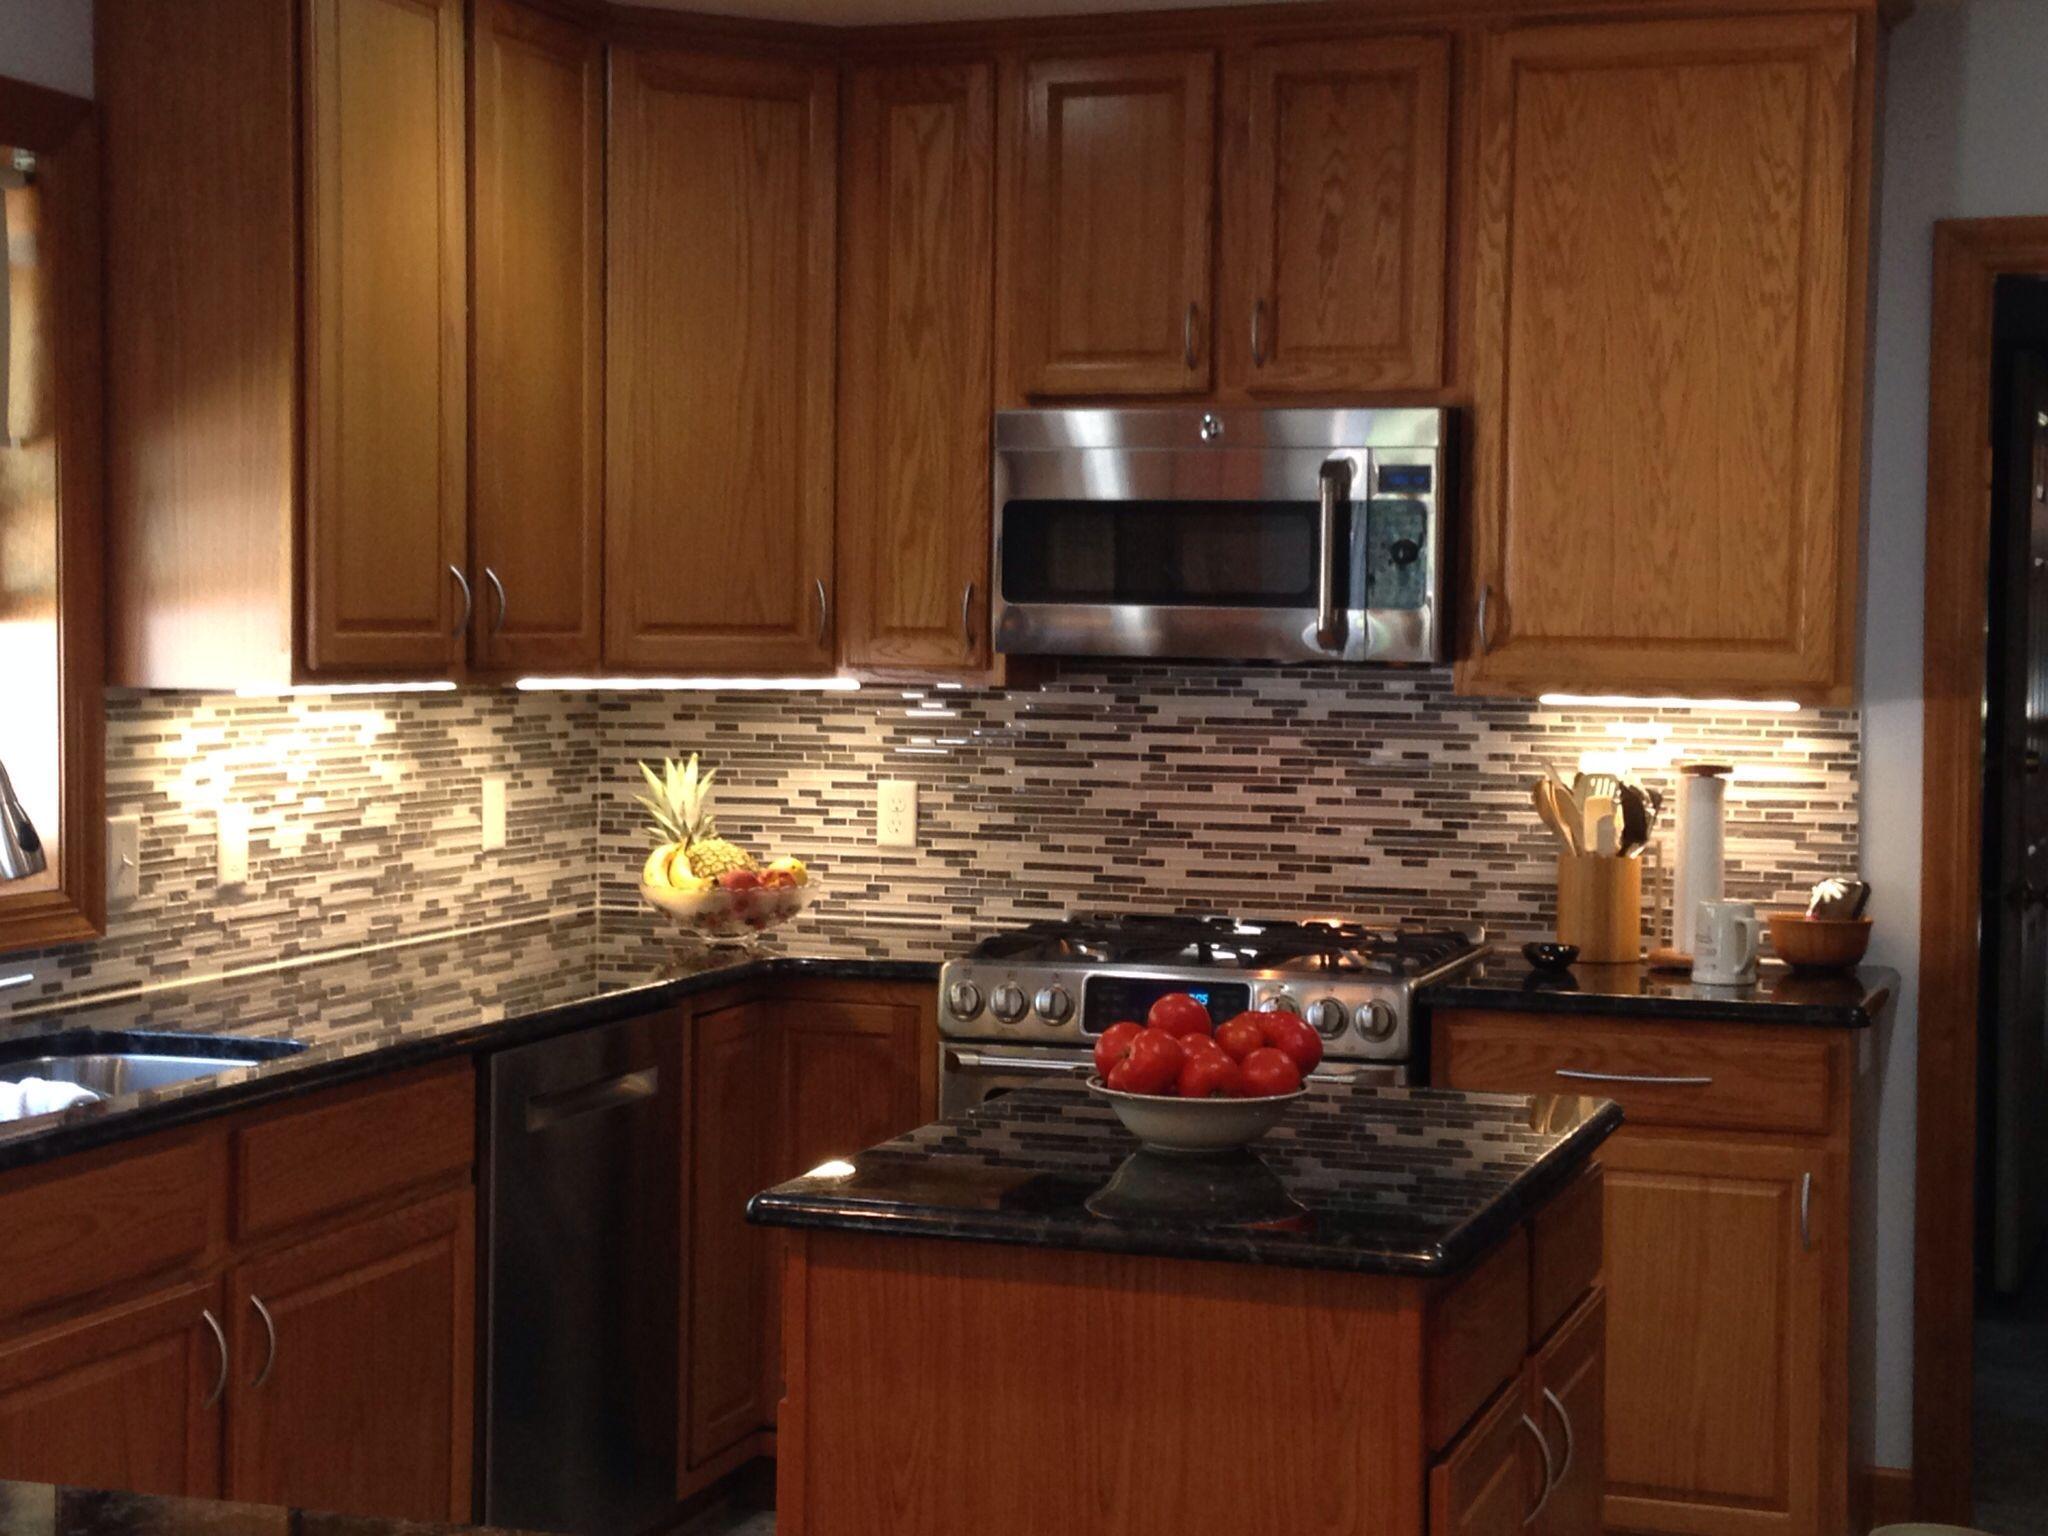 Volga Blue Granite With Oak Cabinets Kitchen Upgrades Kitchen Home Decor